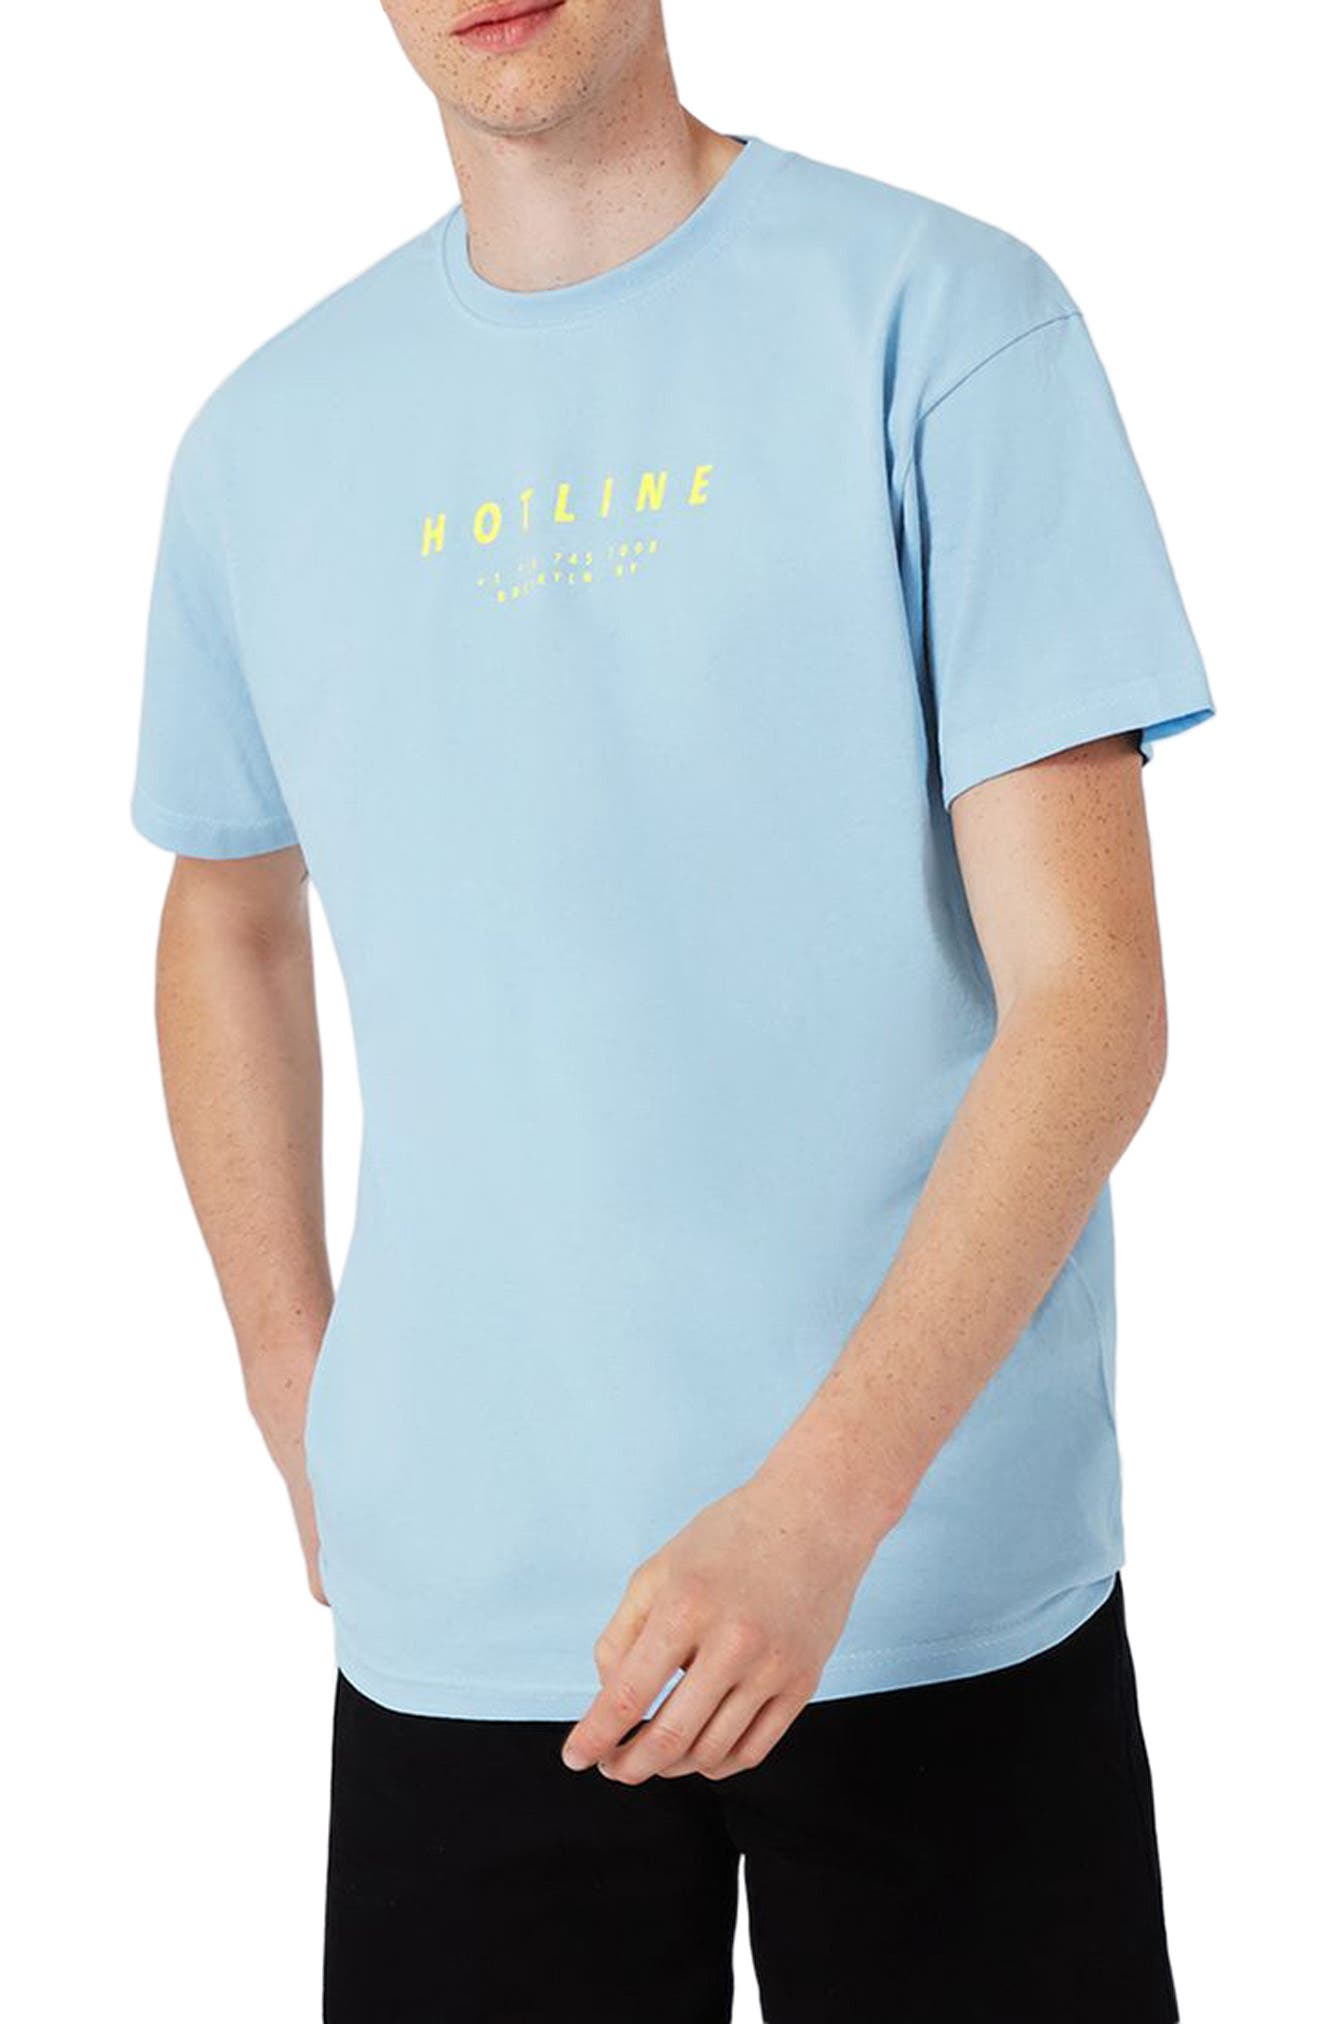 Topman Hotline Print T-Shirt